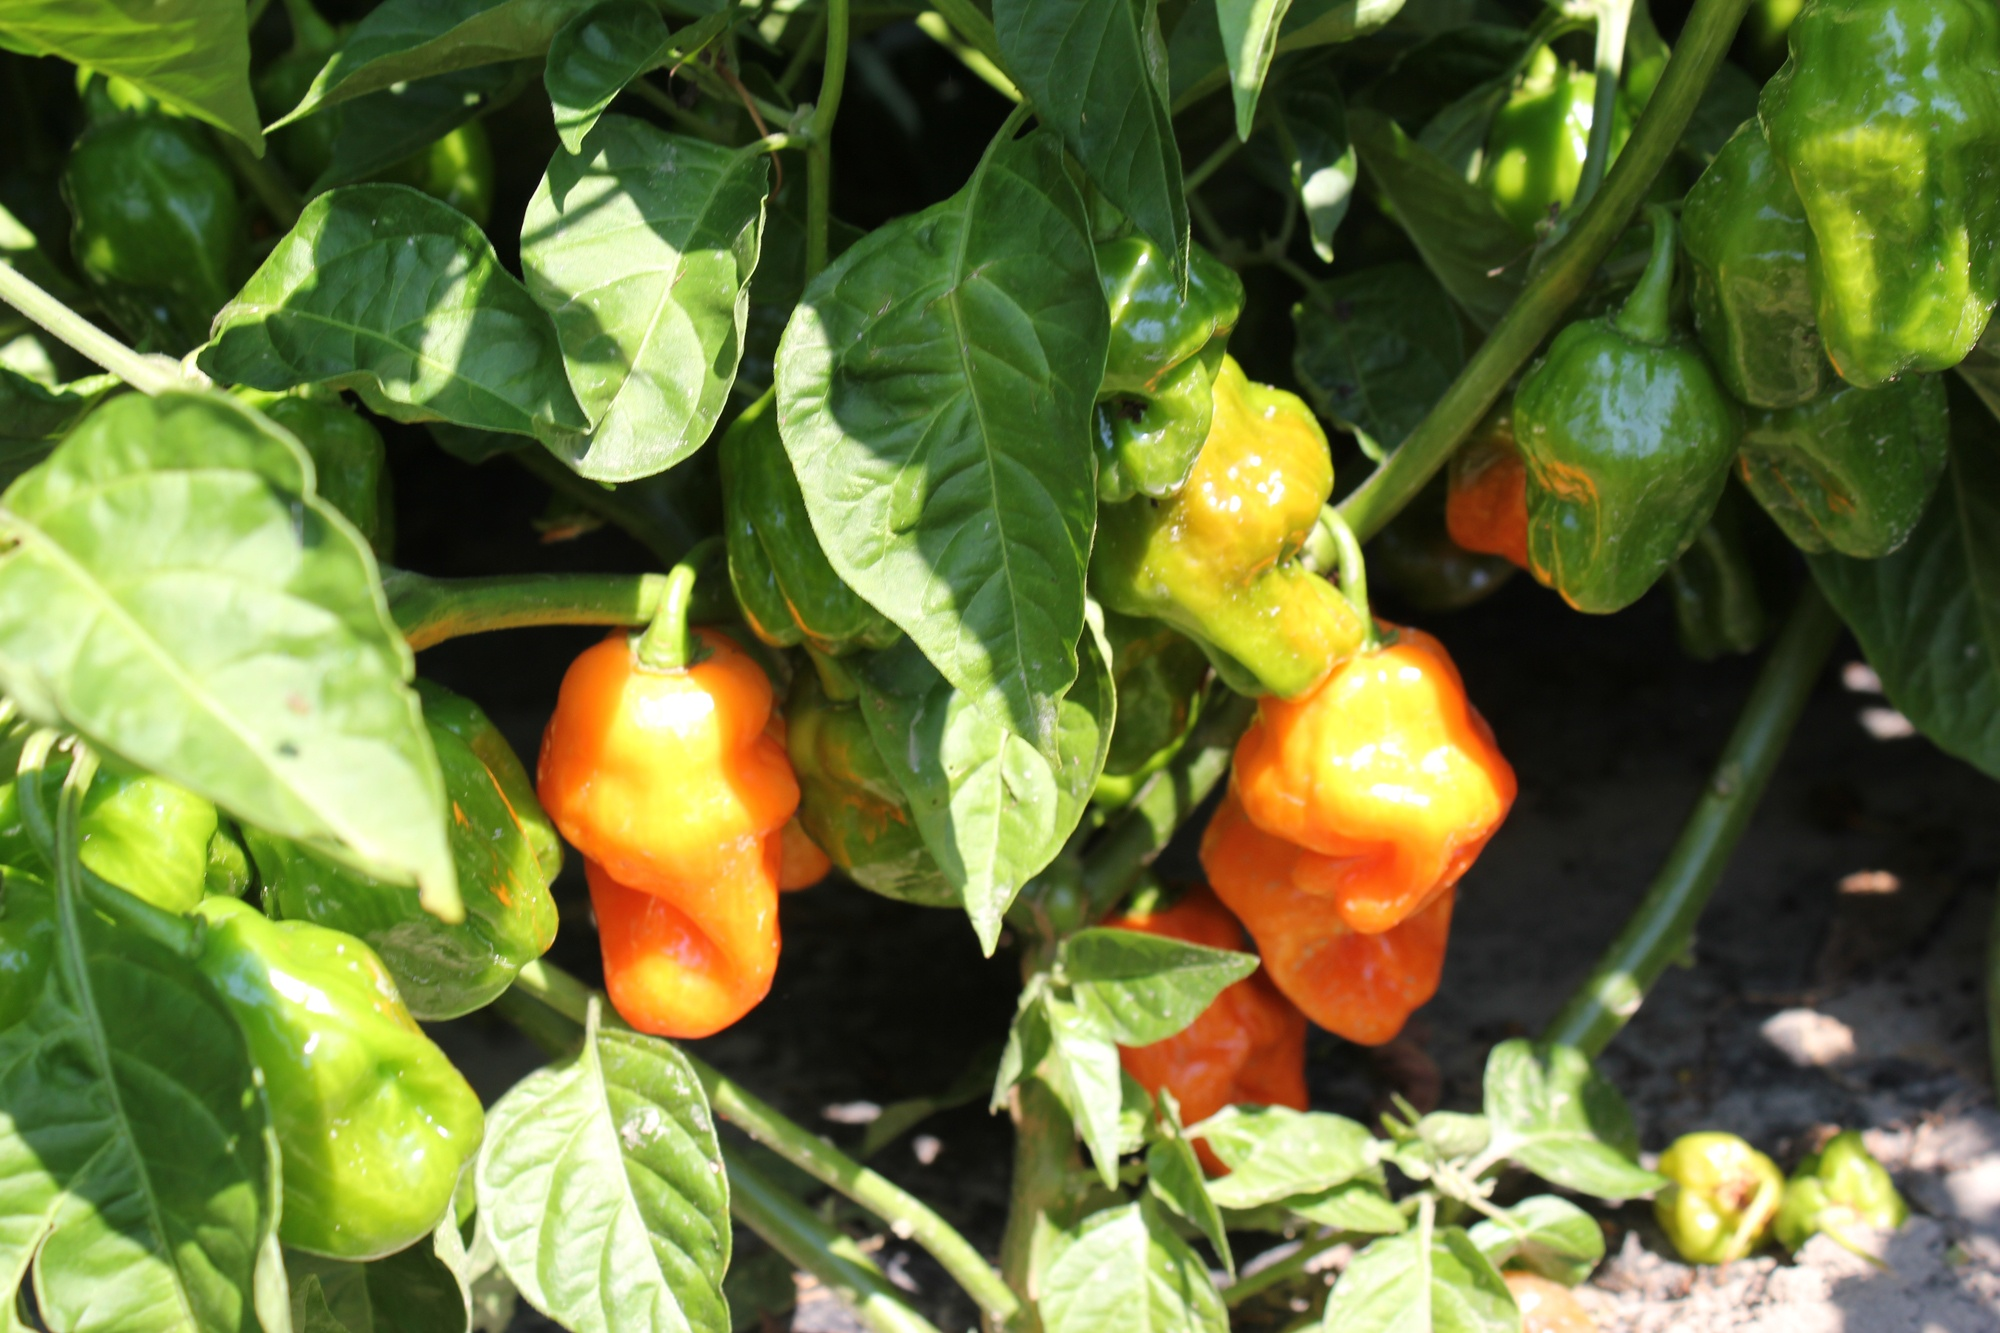 Boston Organics - Habanero Peppers